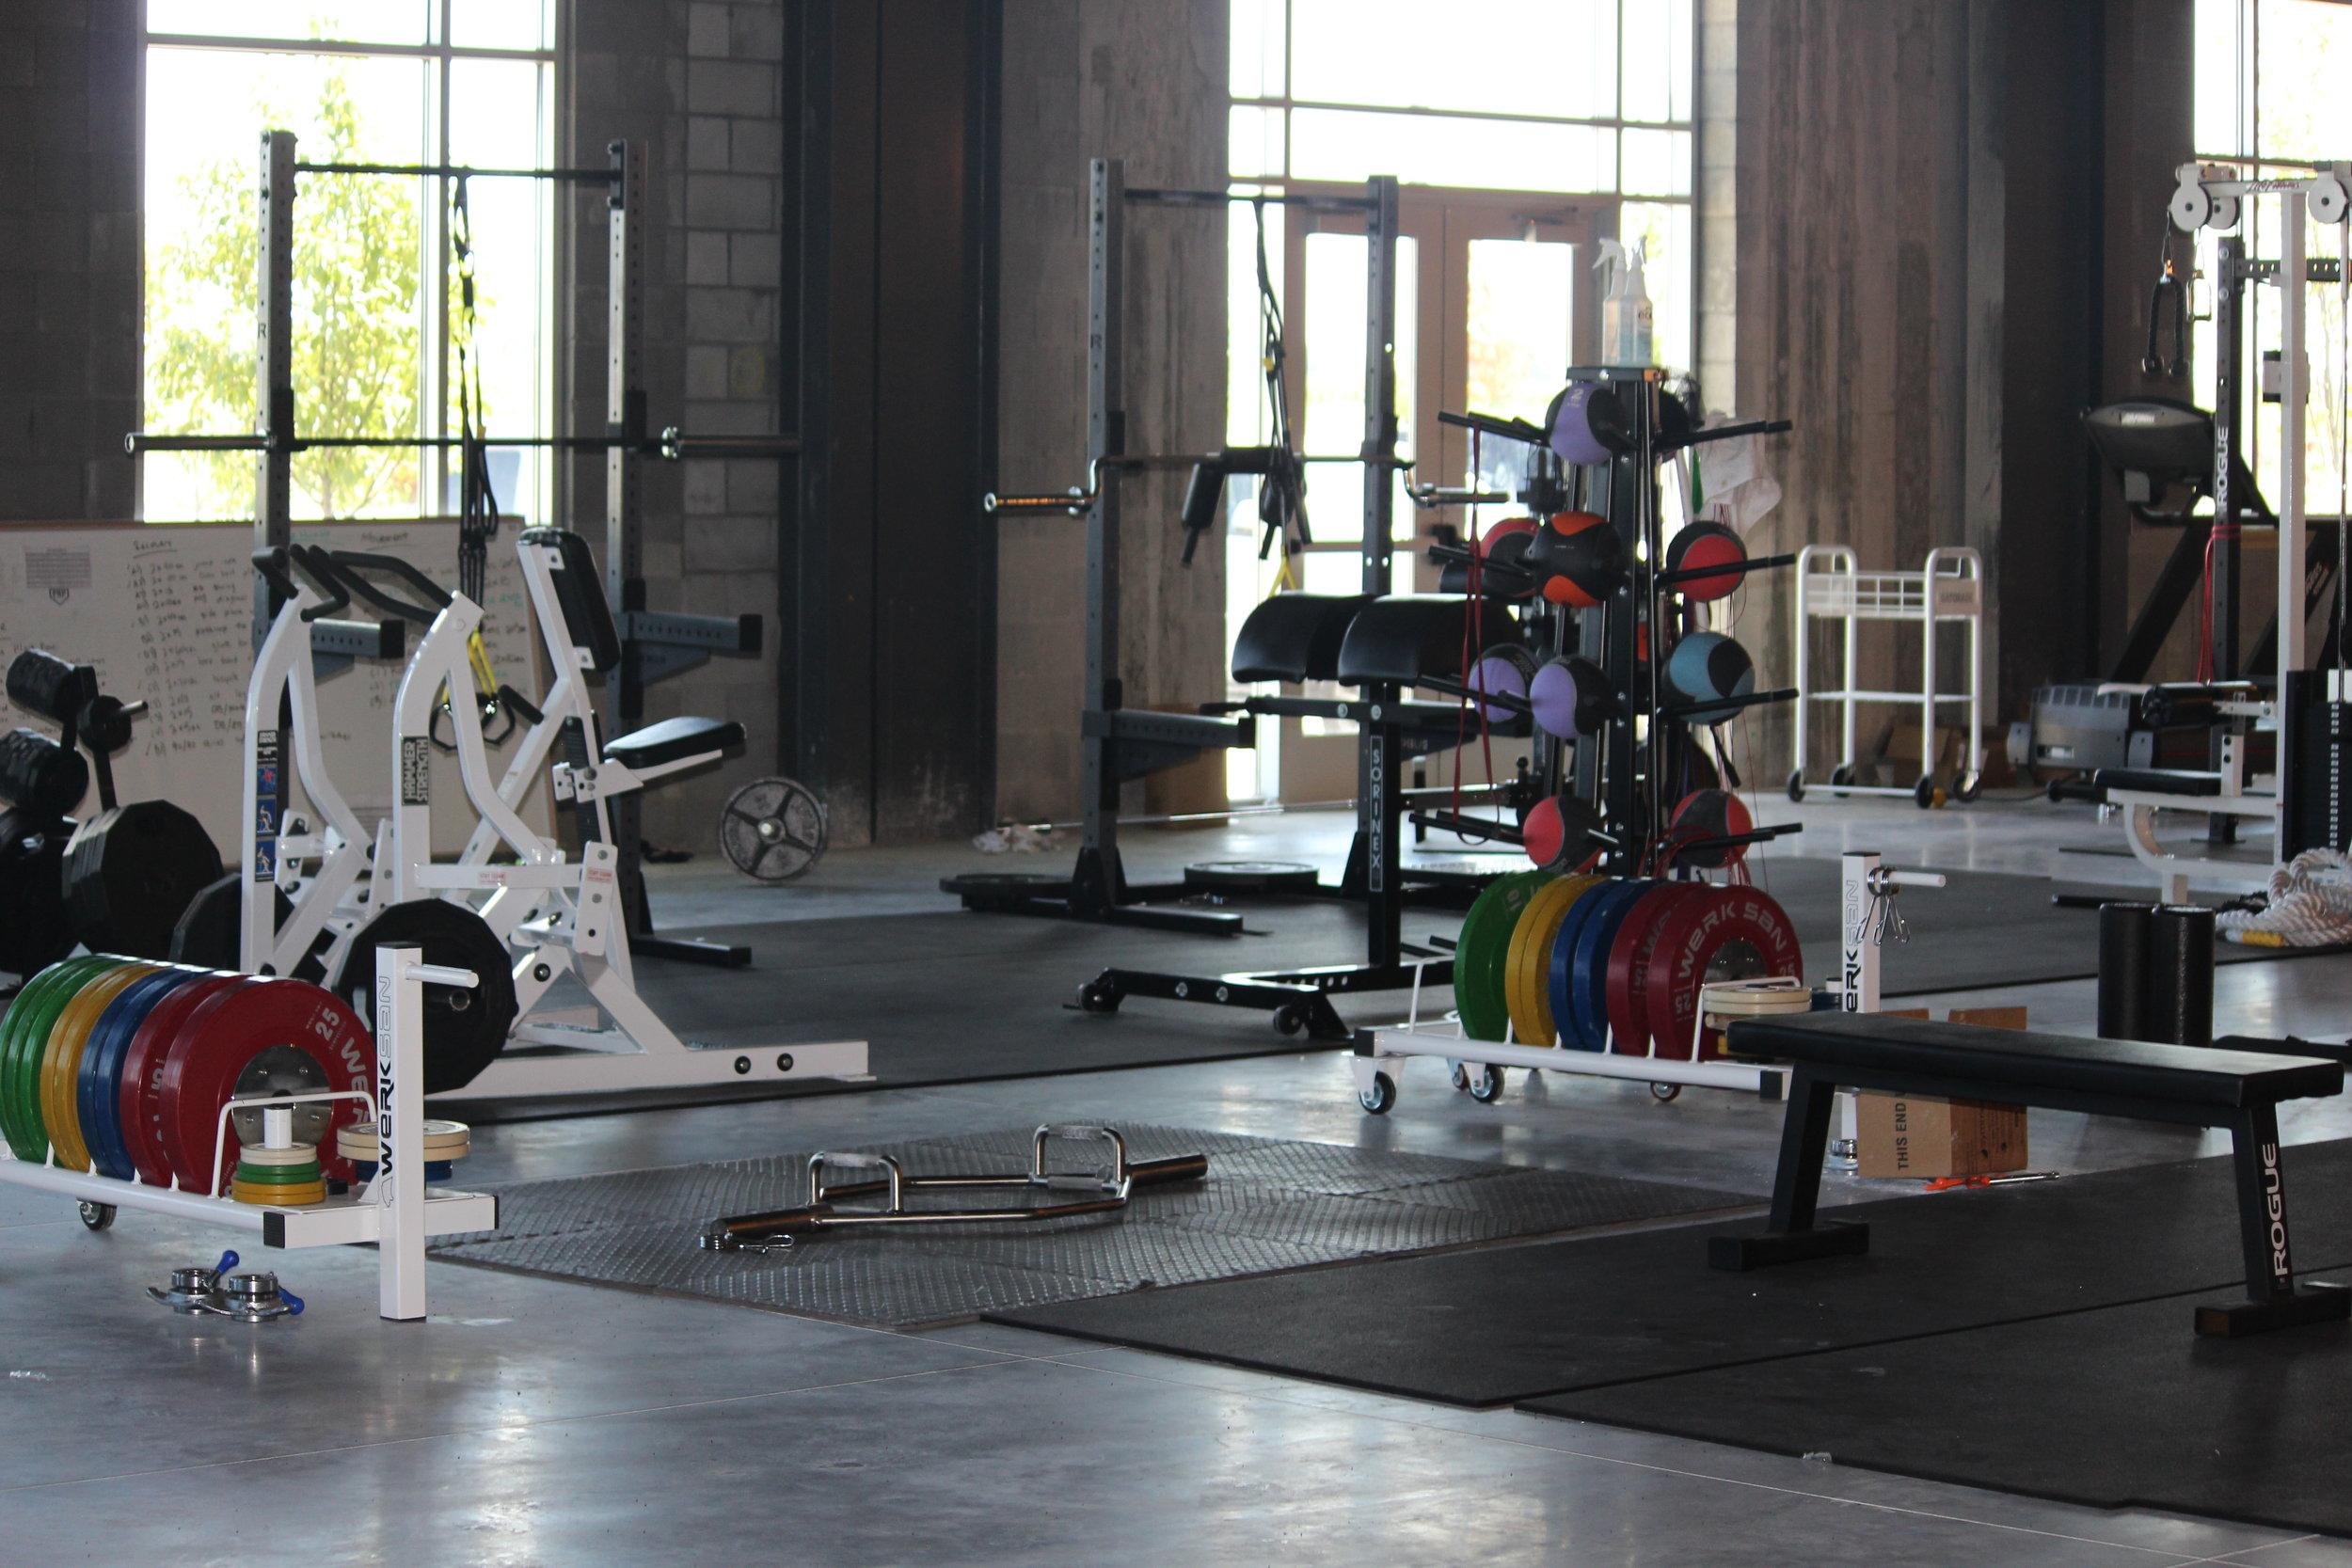 Weight Room 5.JPG